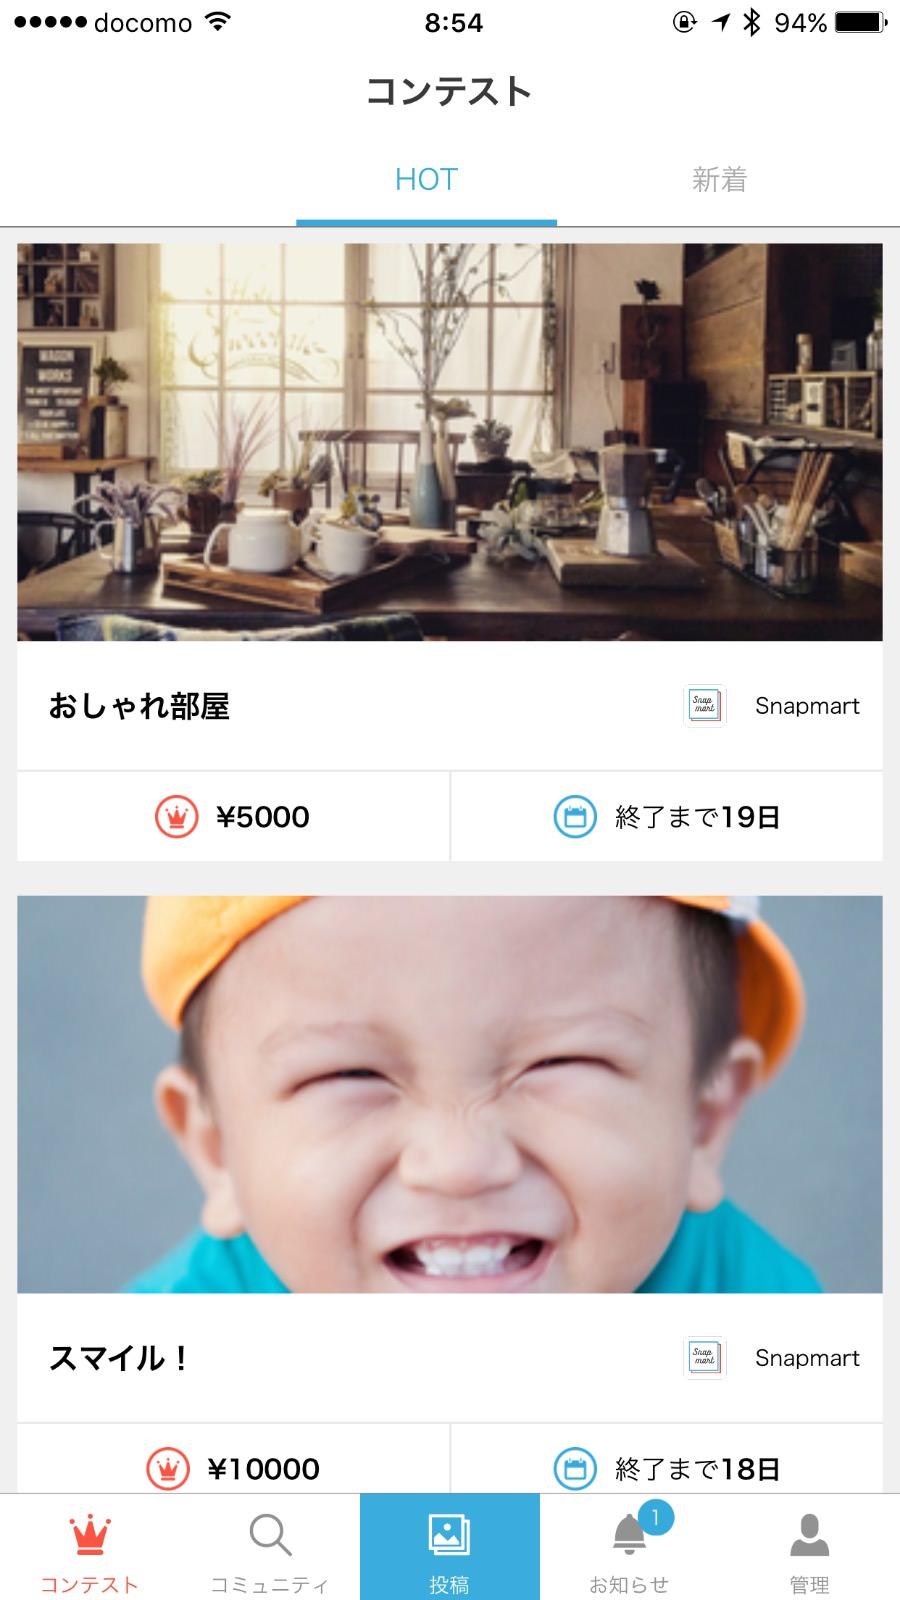 Snapmart 4933